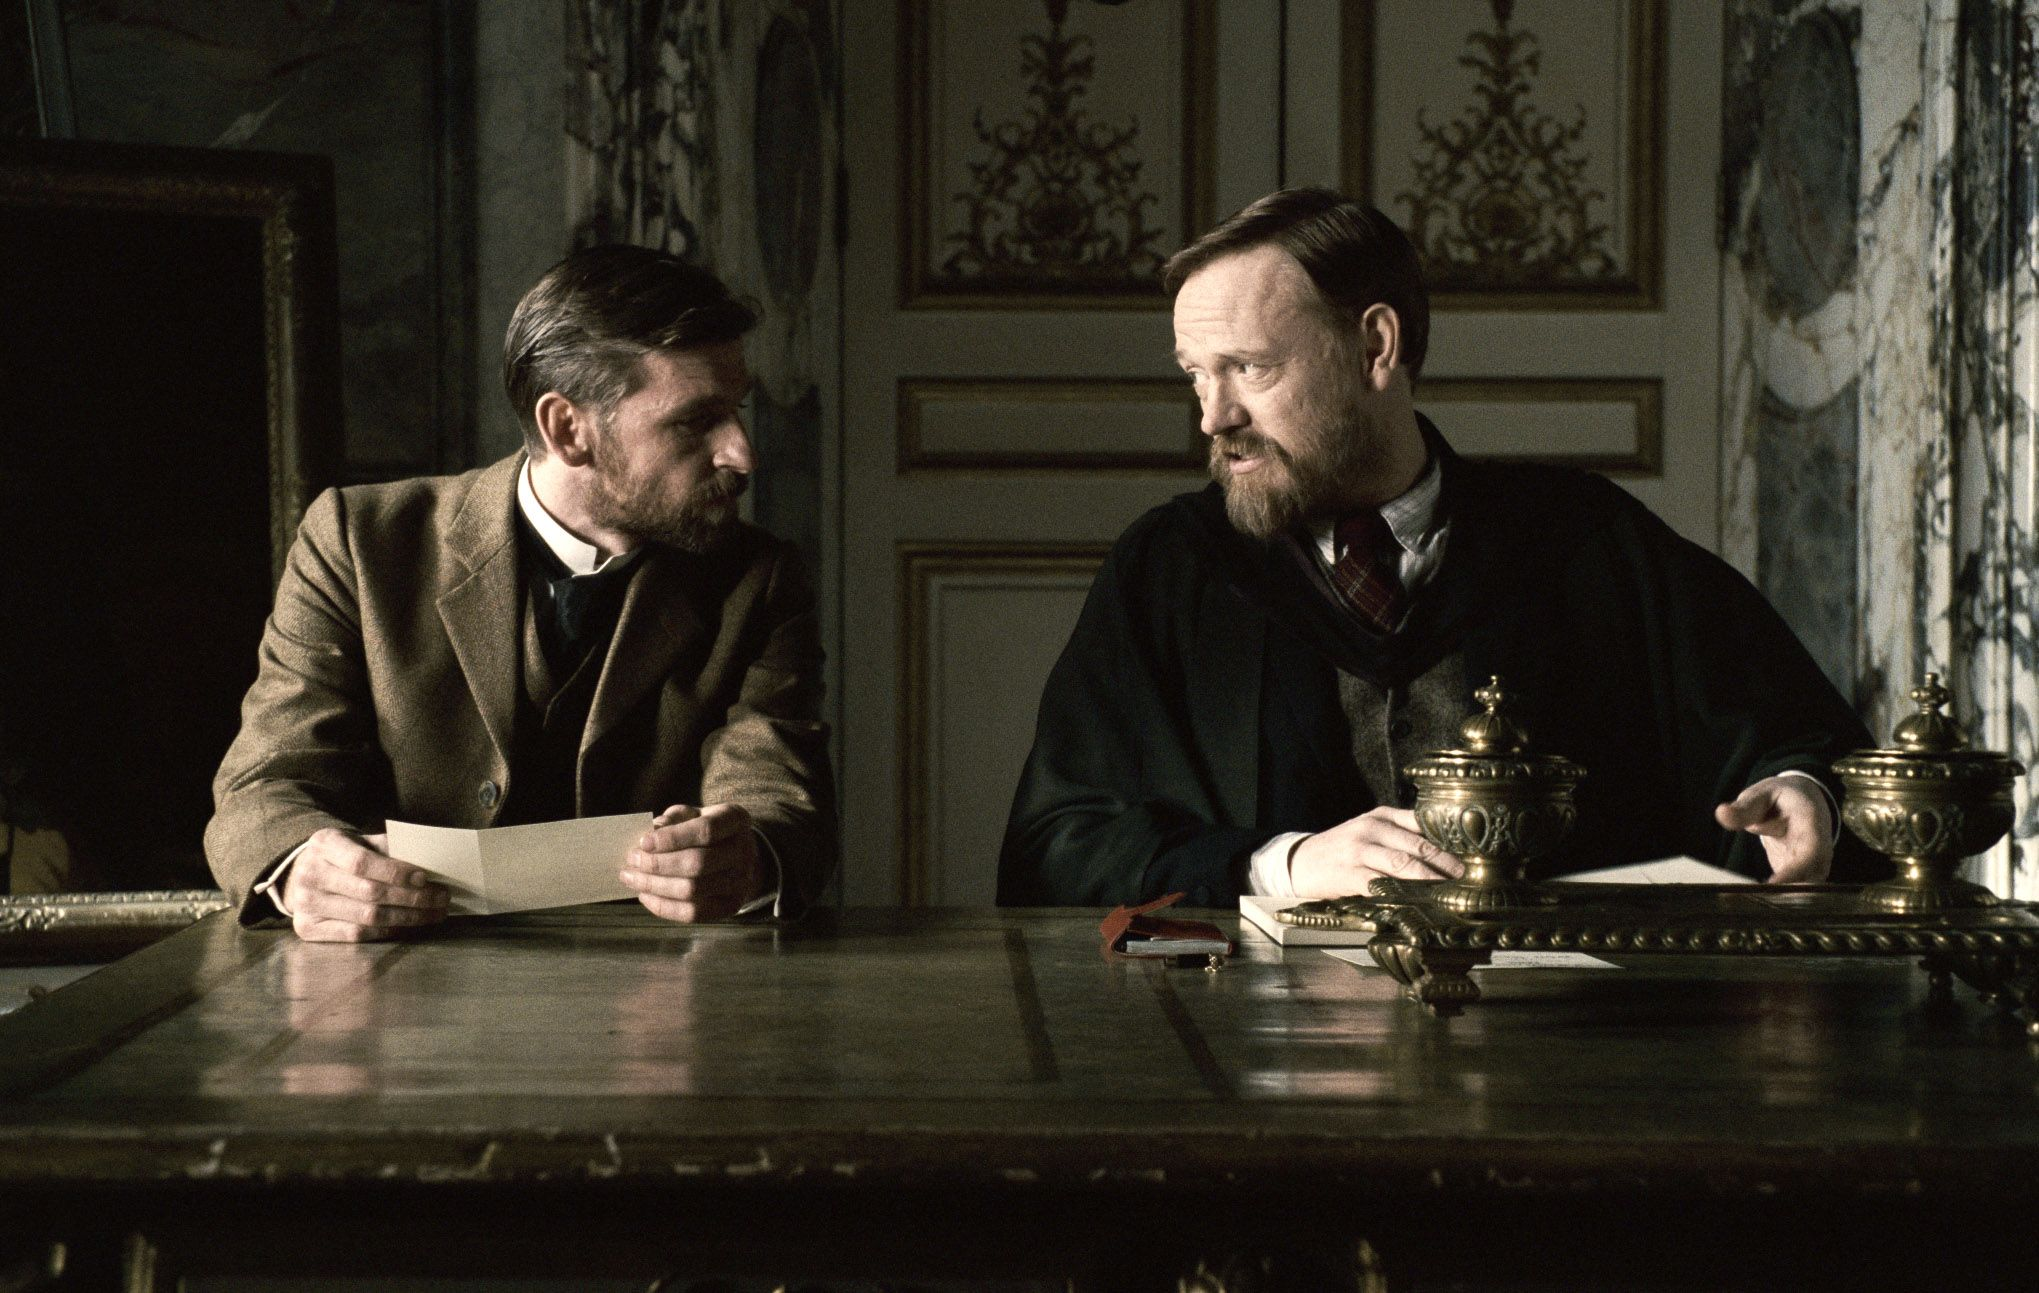 кадры из фильма Шерлок Холмс: Игра теней Джаред Харрис,